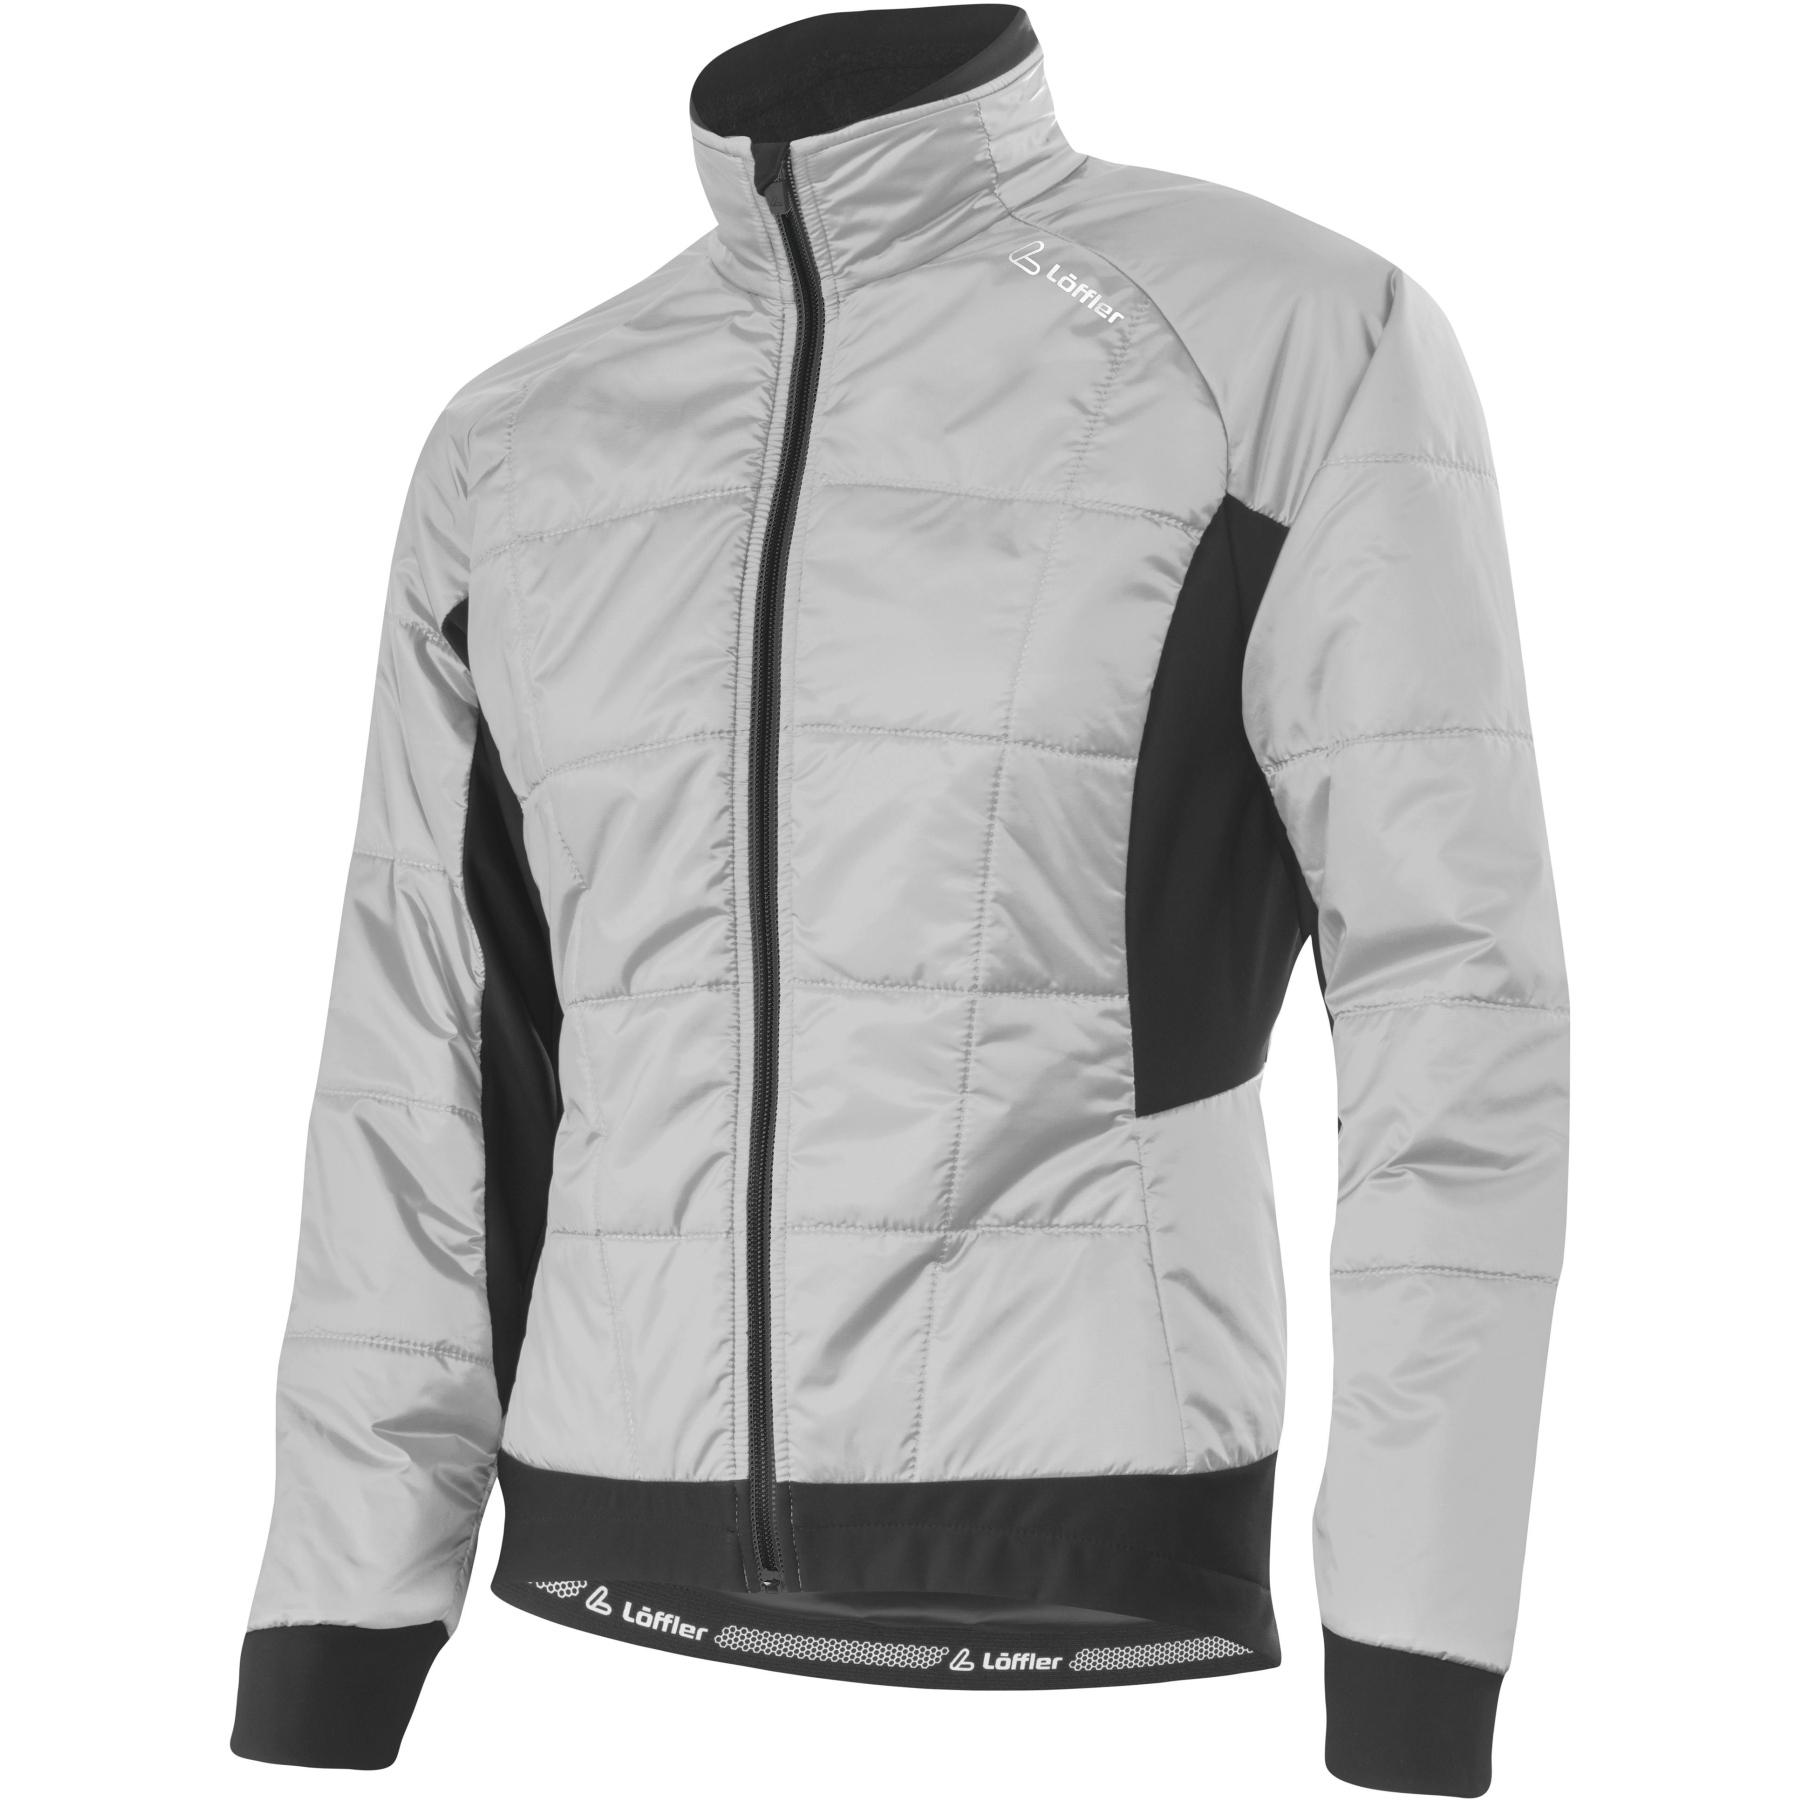 Löffler Bike Iso Jacke Hotbond® PL60 Damen 20603 - silver grey 906